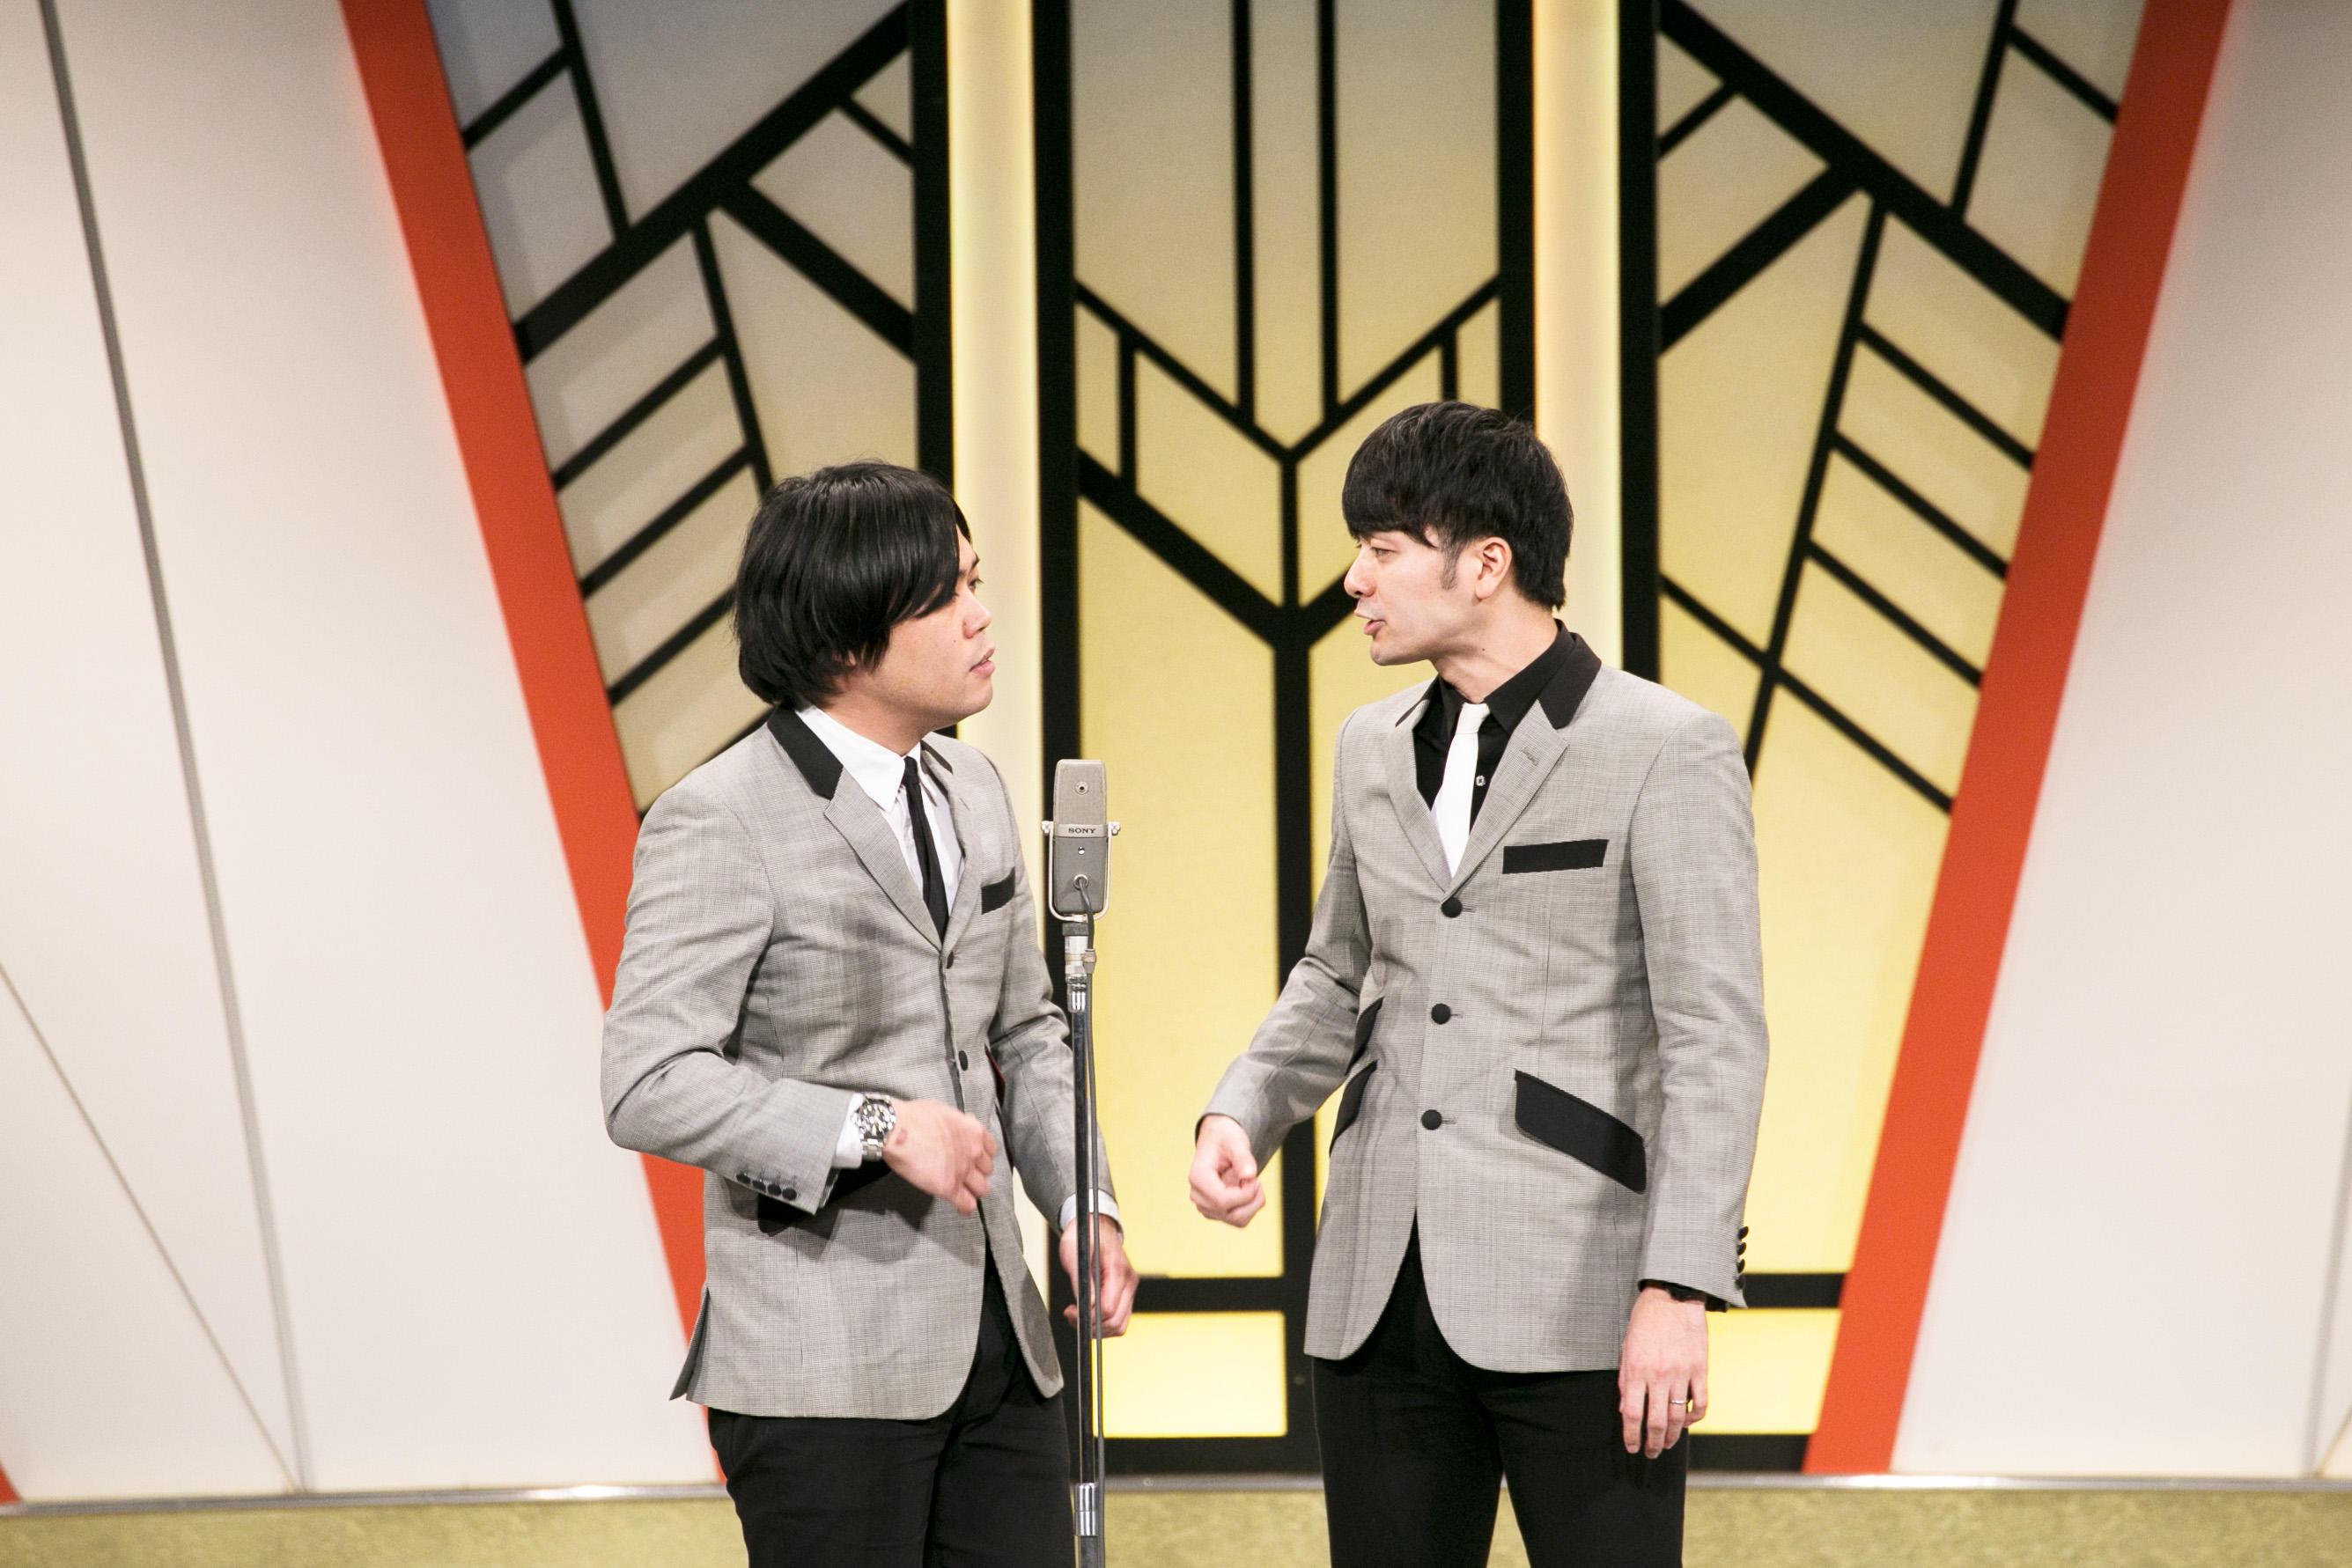 http://news.yoshimoto.co.jp/20171205215913-6447b13450929fa96fa6f9886c155900abd2222c.jpg